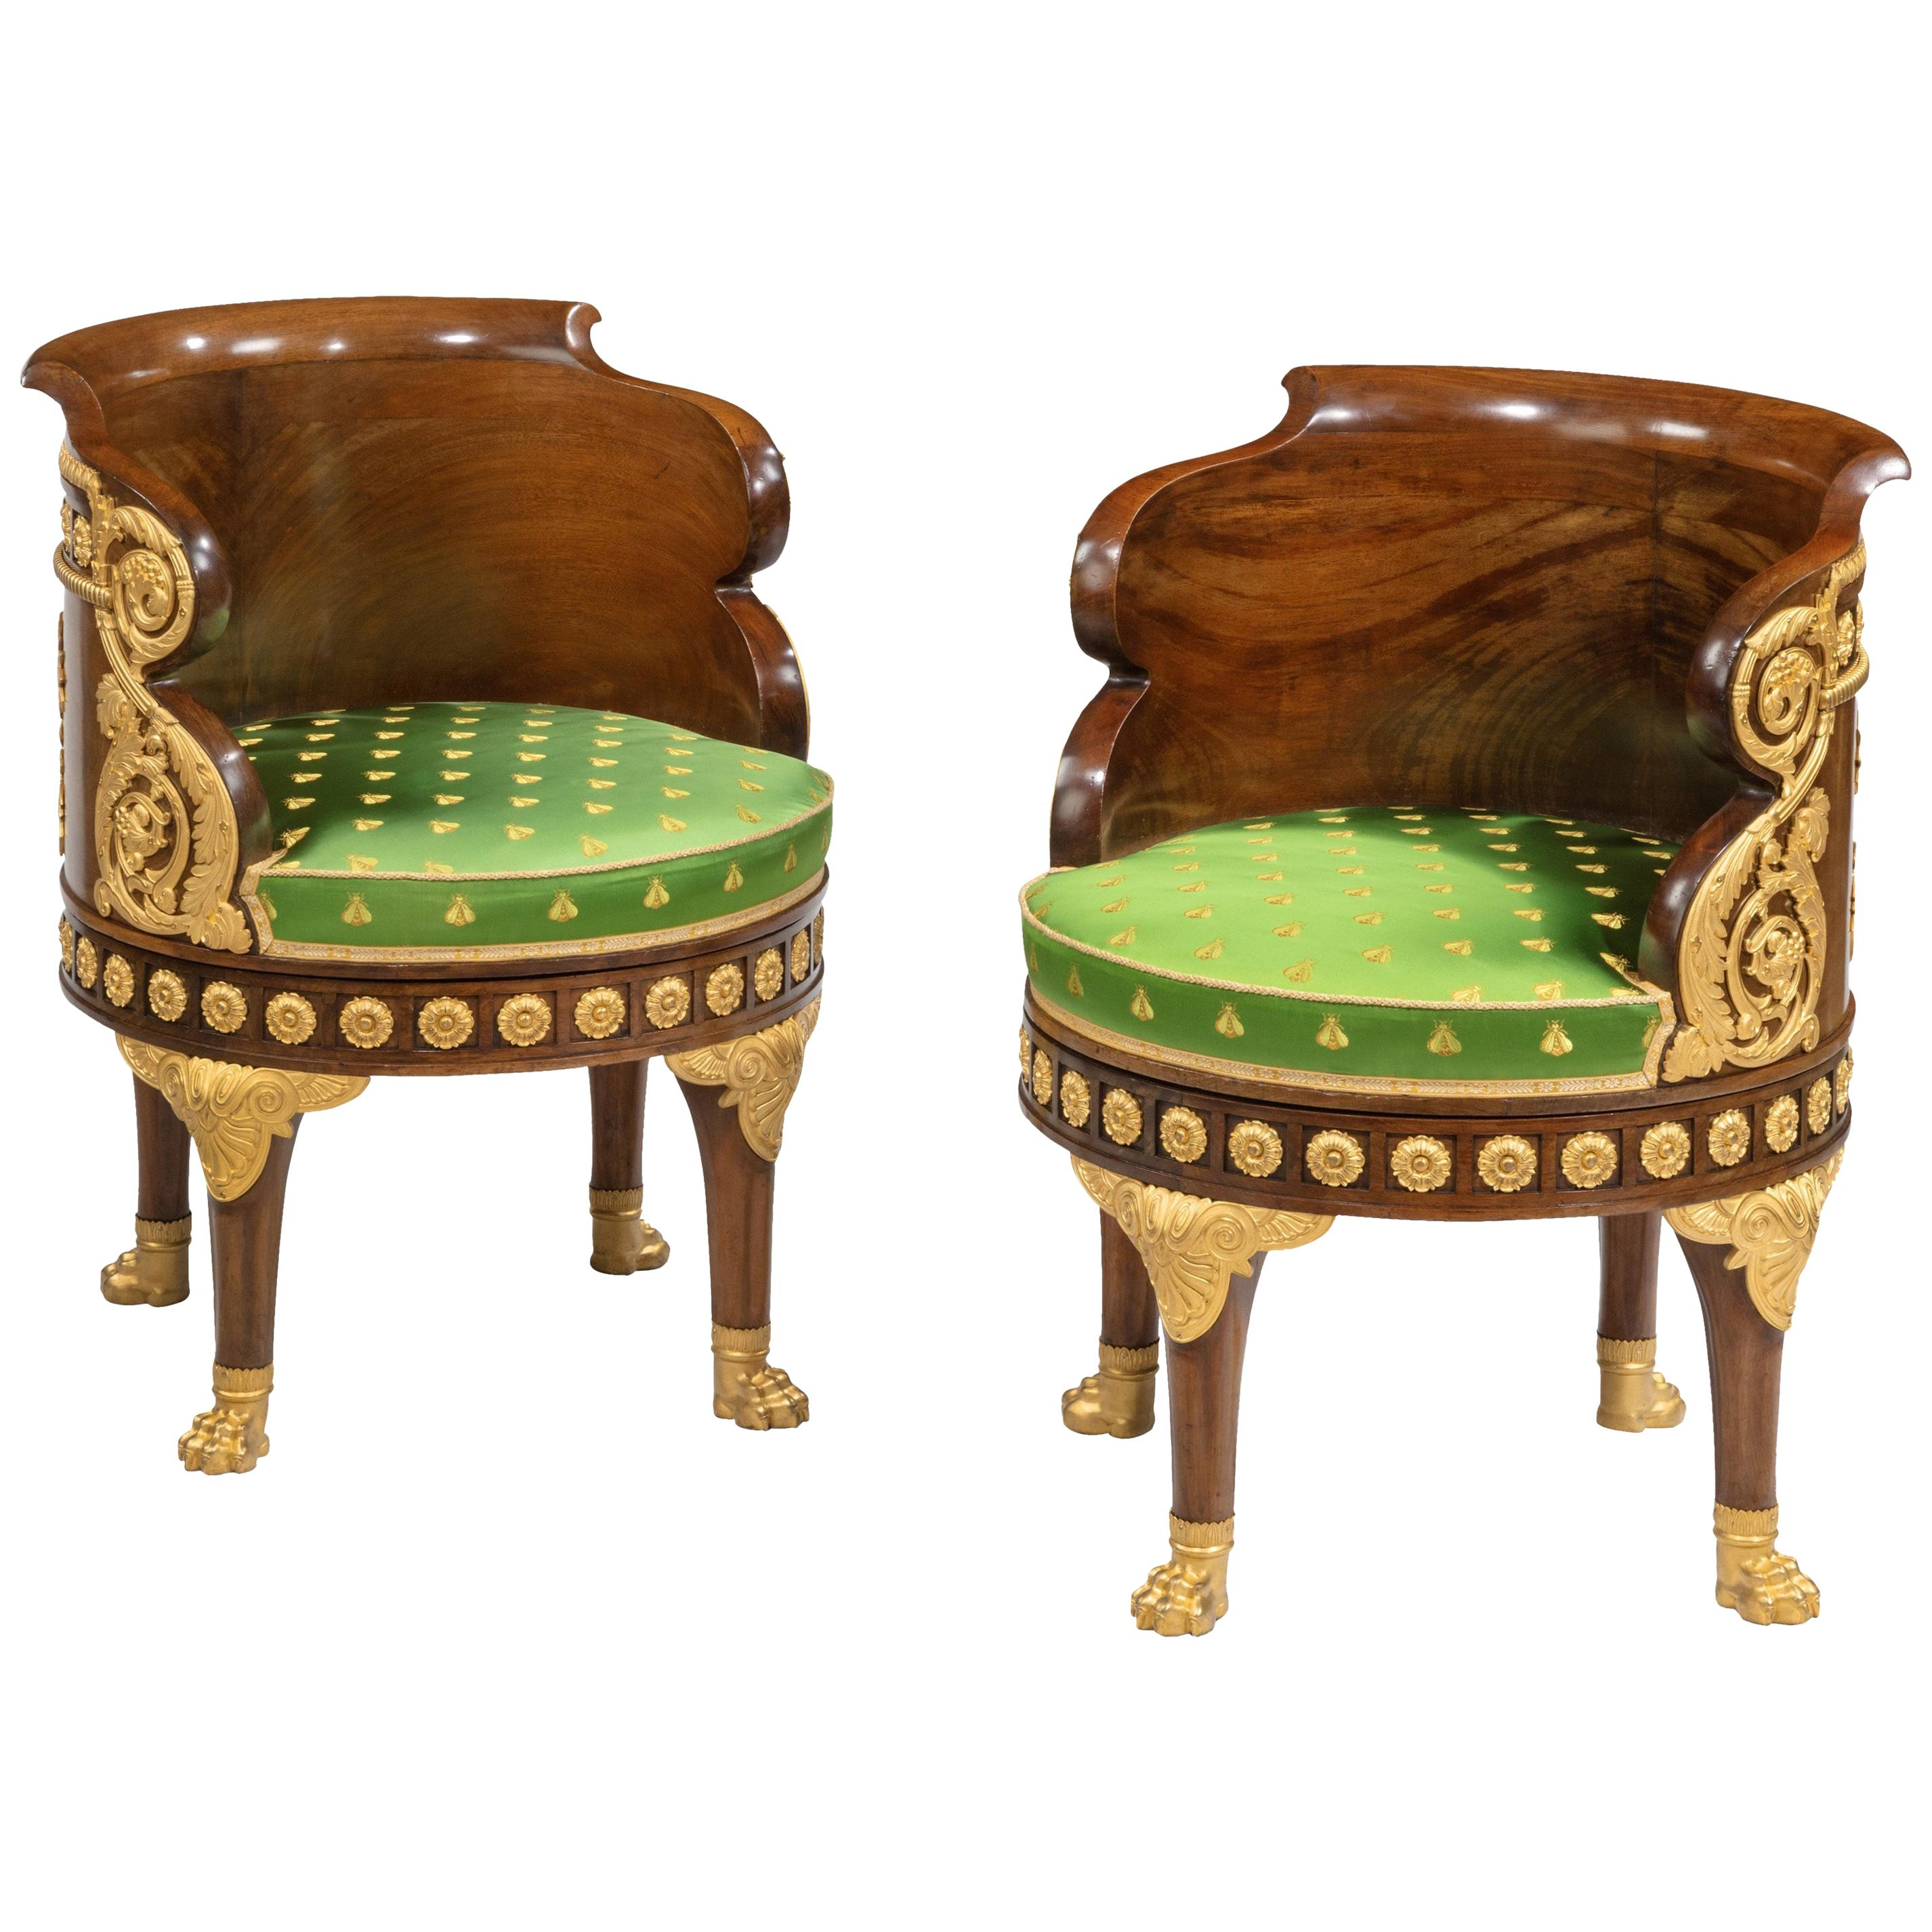 19th Century Pair of Mahogany Revolving Chairs of the Napoleon III Empire Period